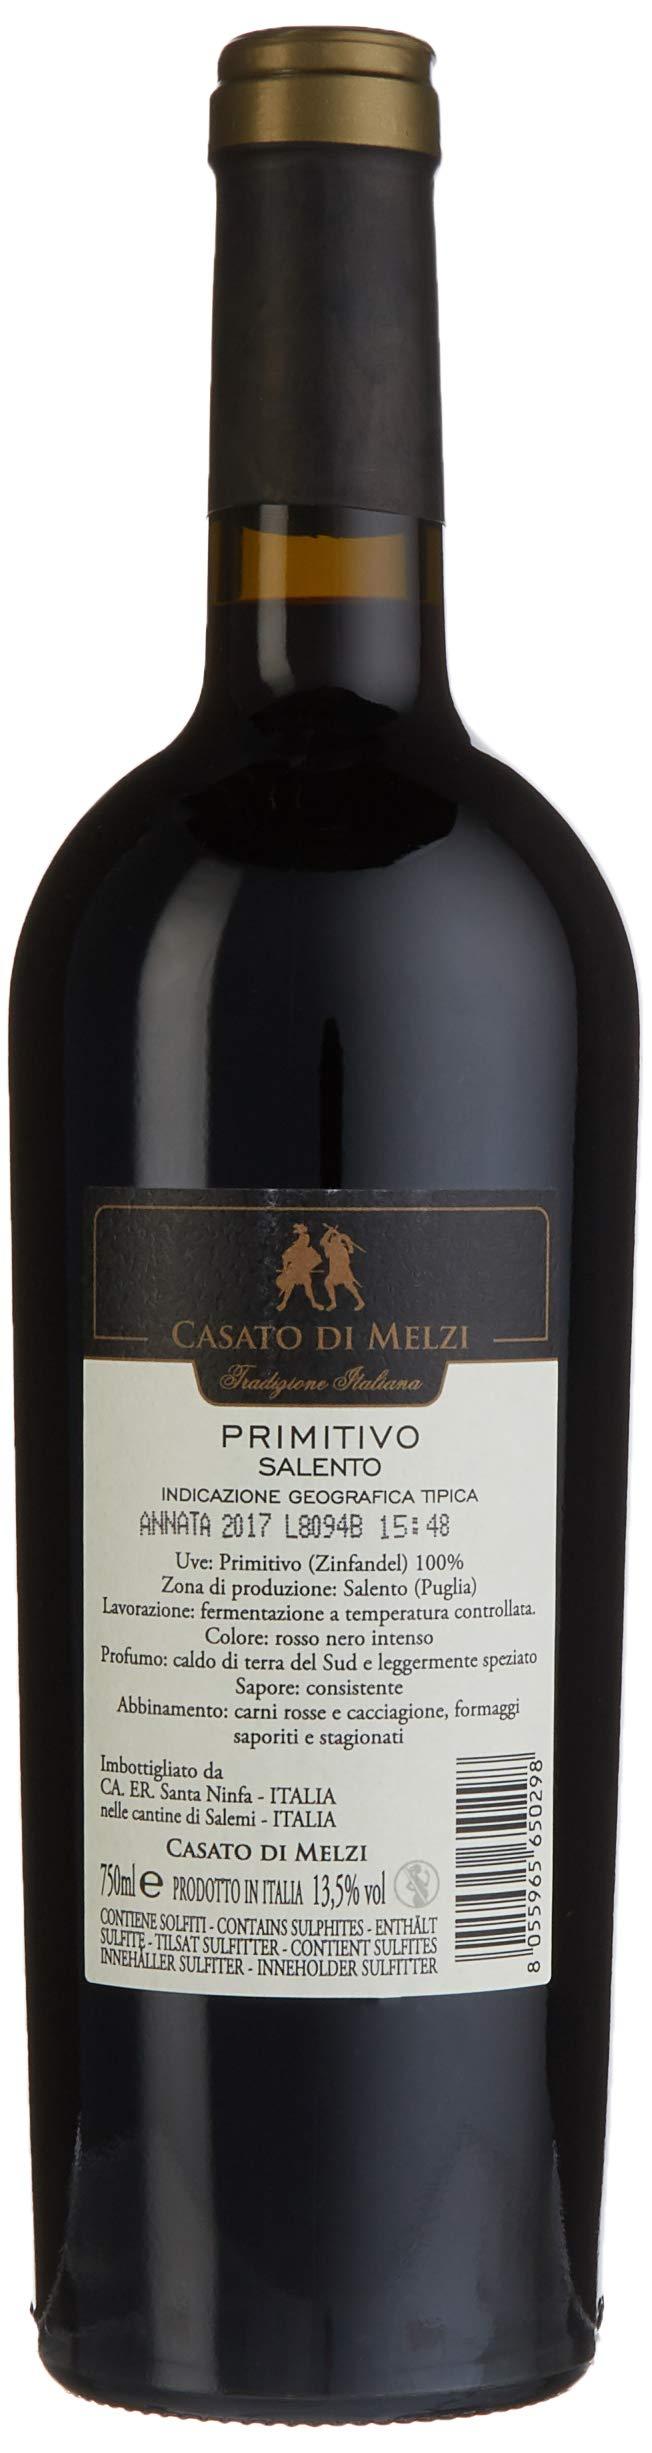 Casato-di-Melzi-Primitivo-del-Salento-IGT-trocken-20162017-6-x-075-l